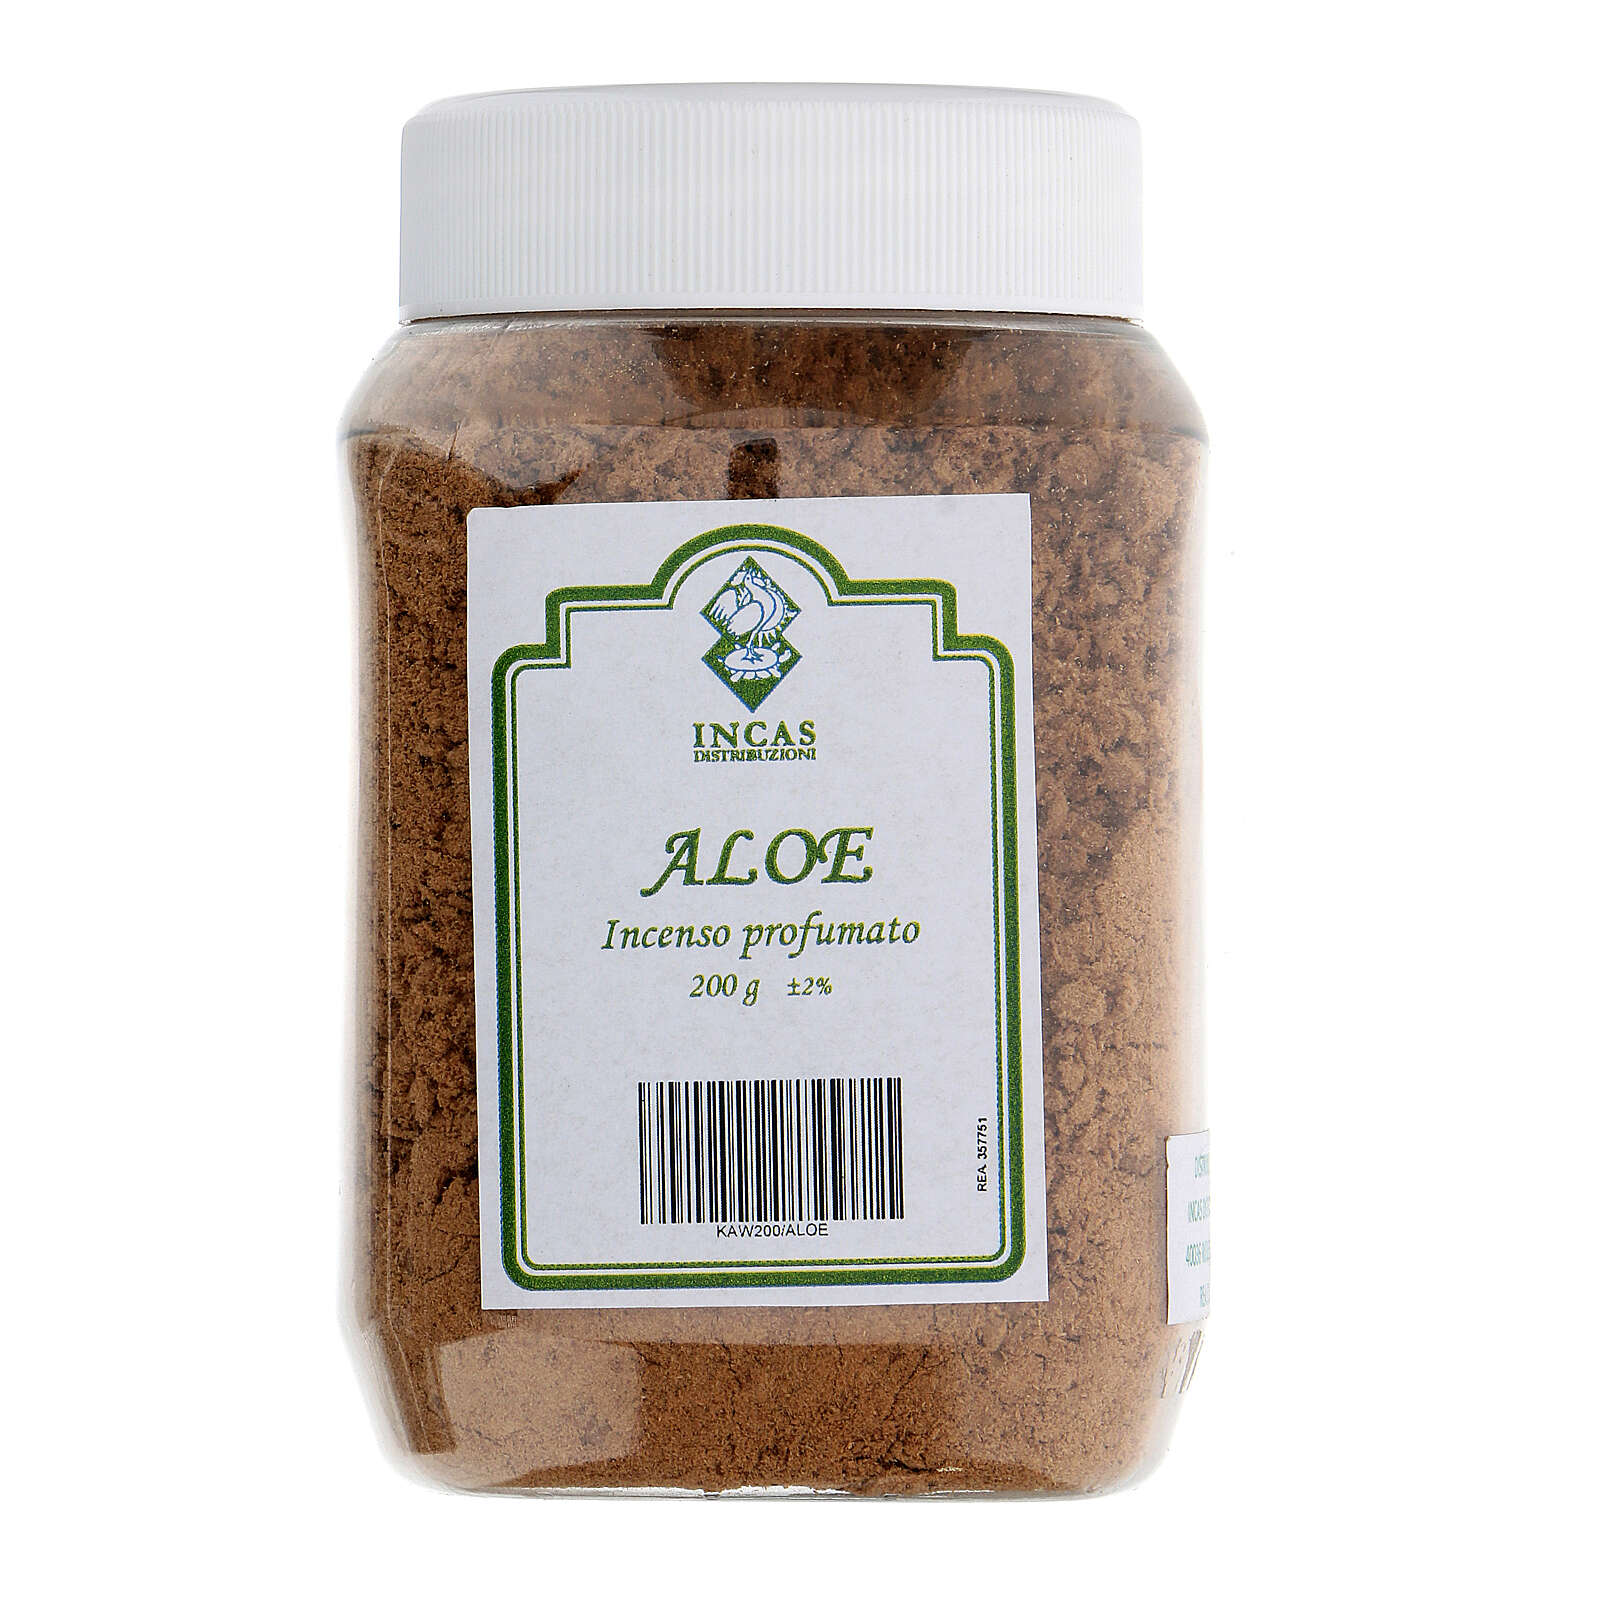 Incenso Aloe profumato in polvere 200 gr 3